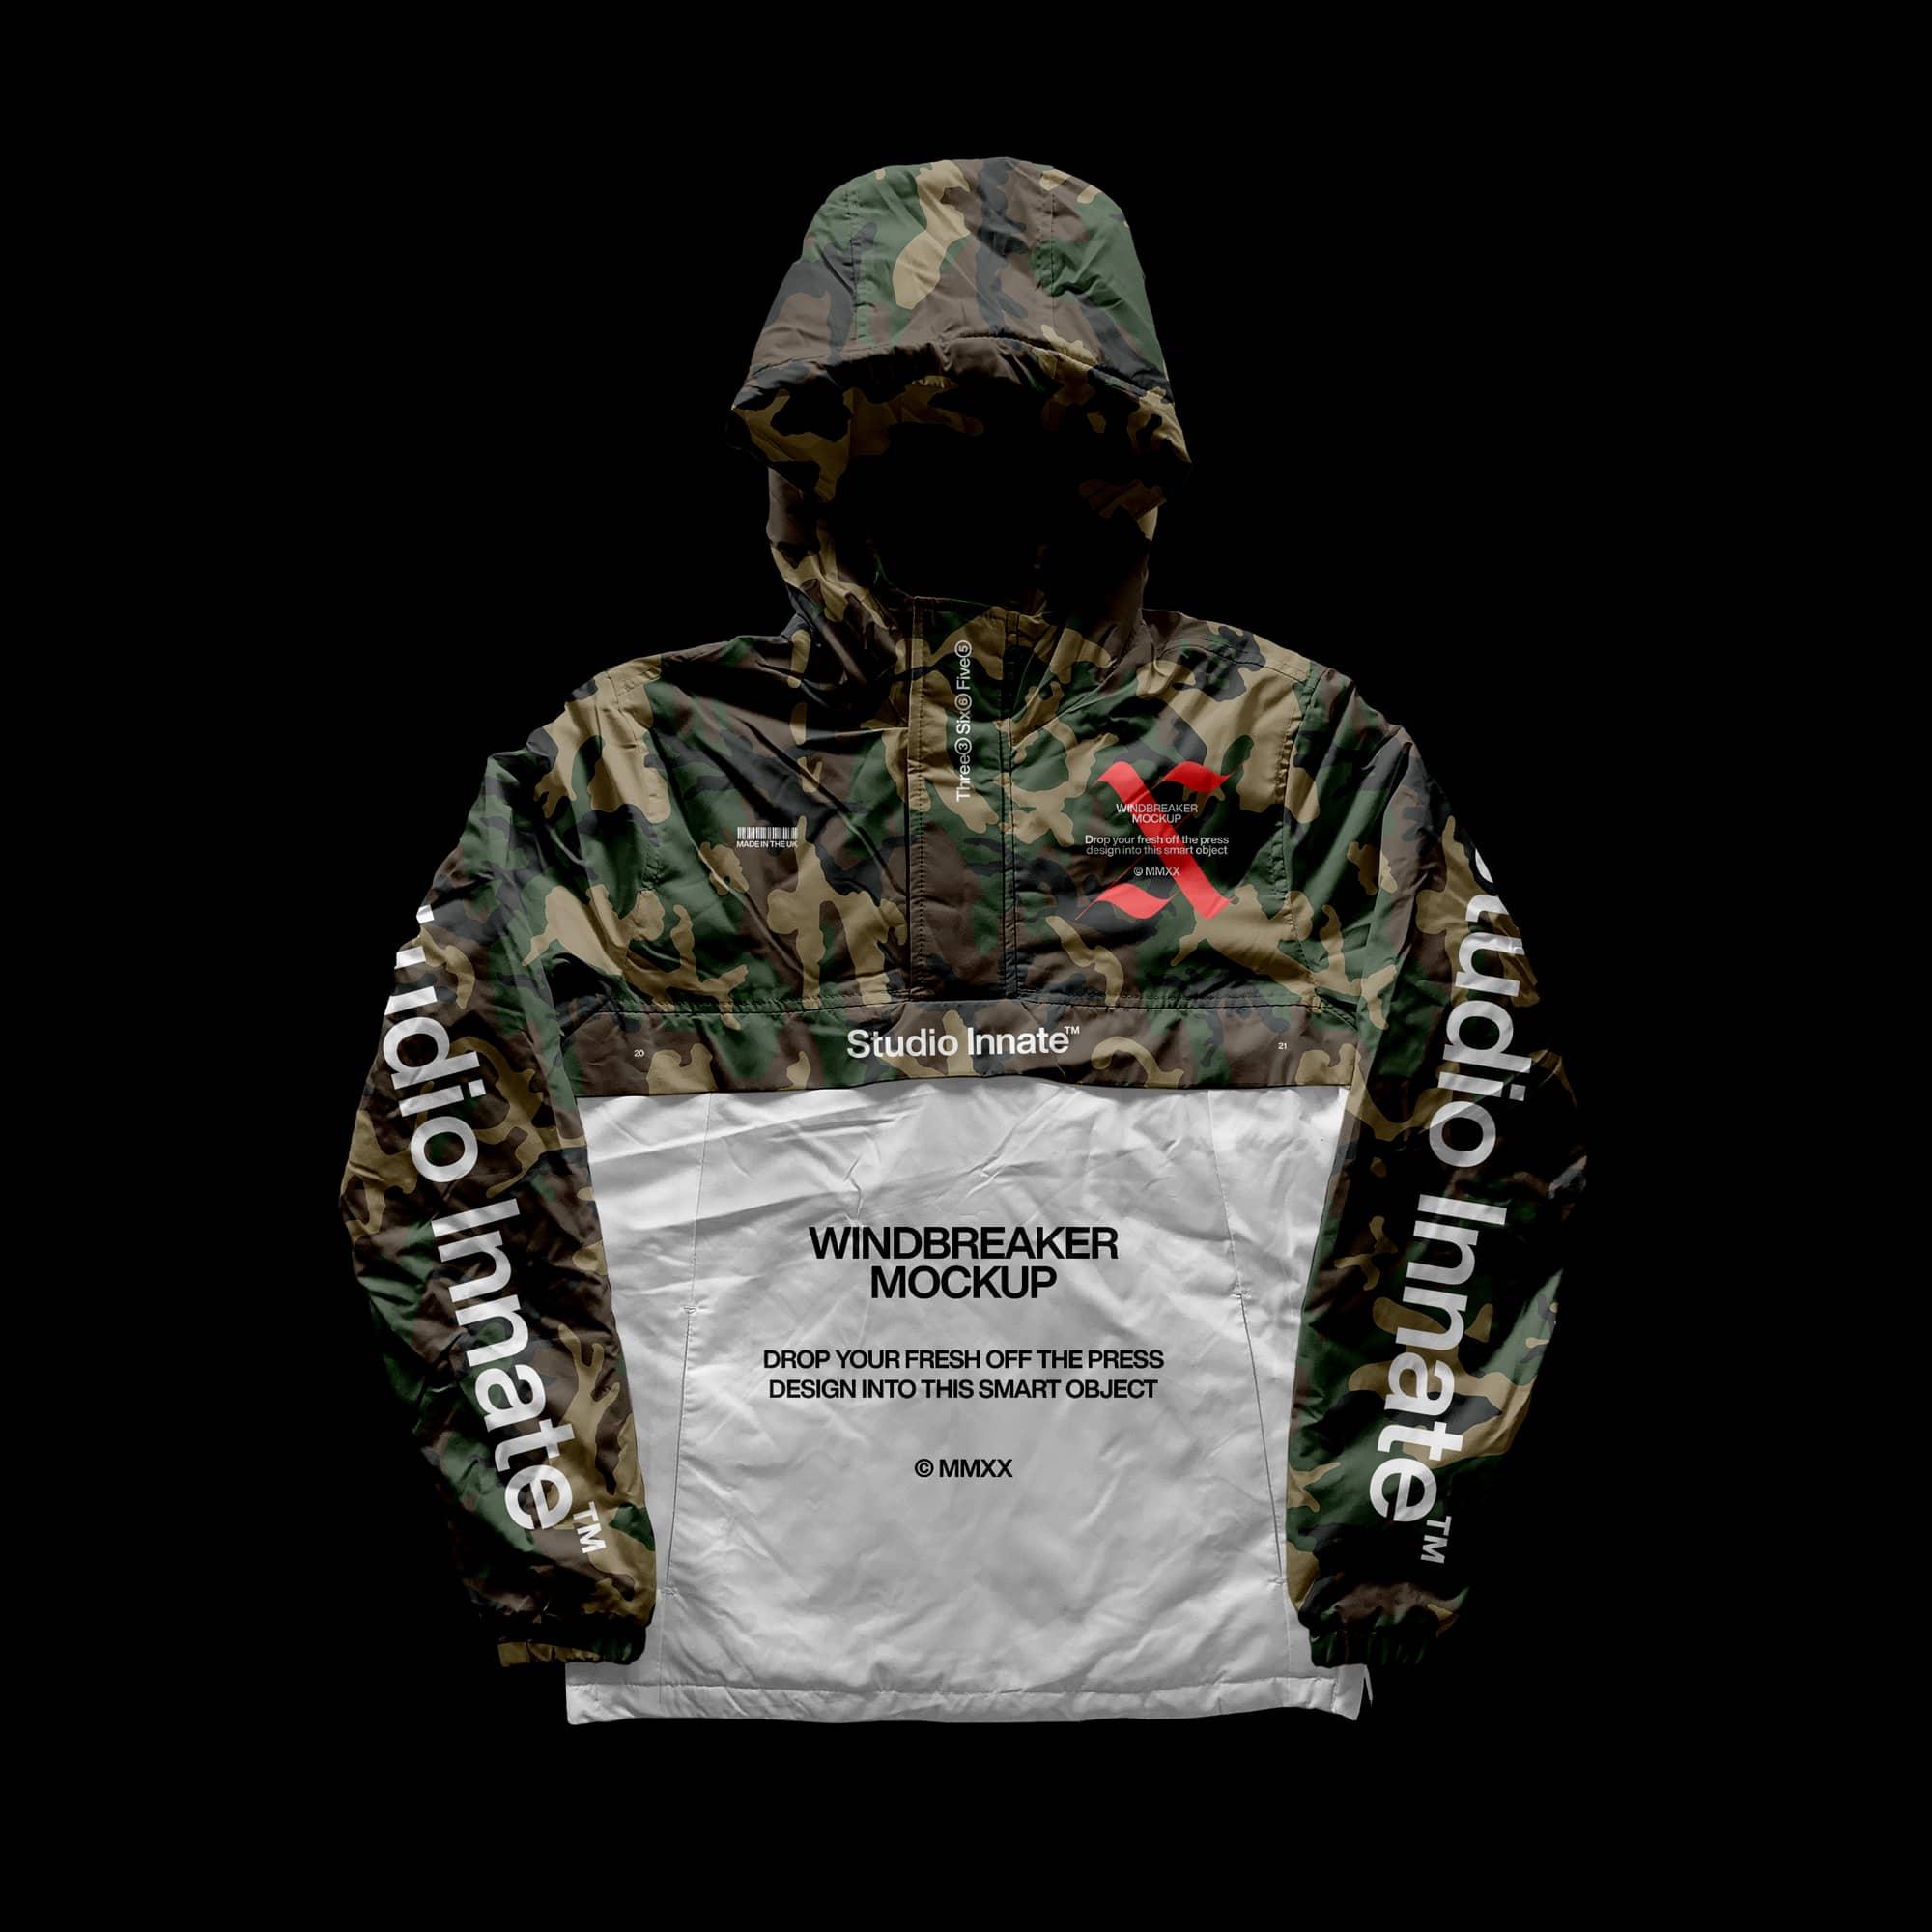 Windbreaker-by-Studio-Innate-black-front